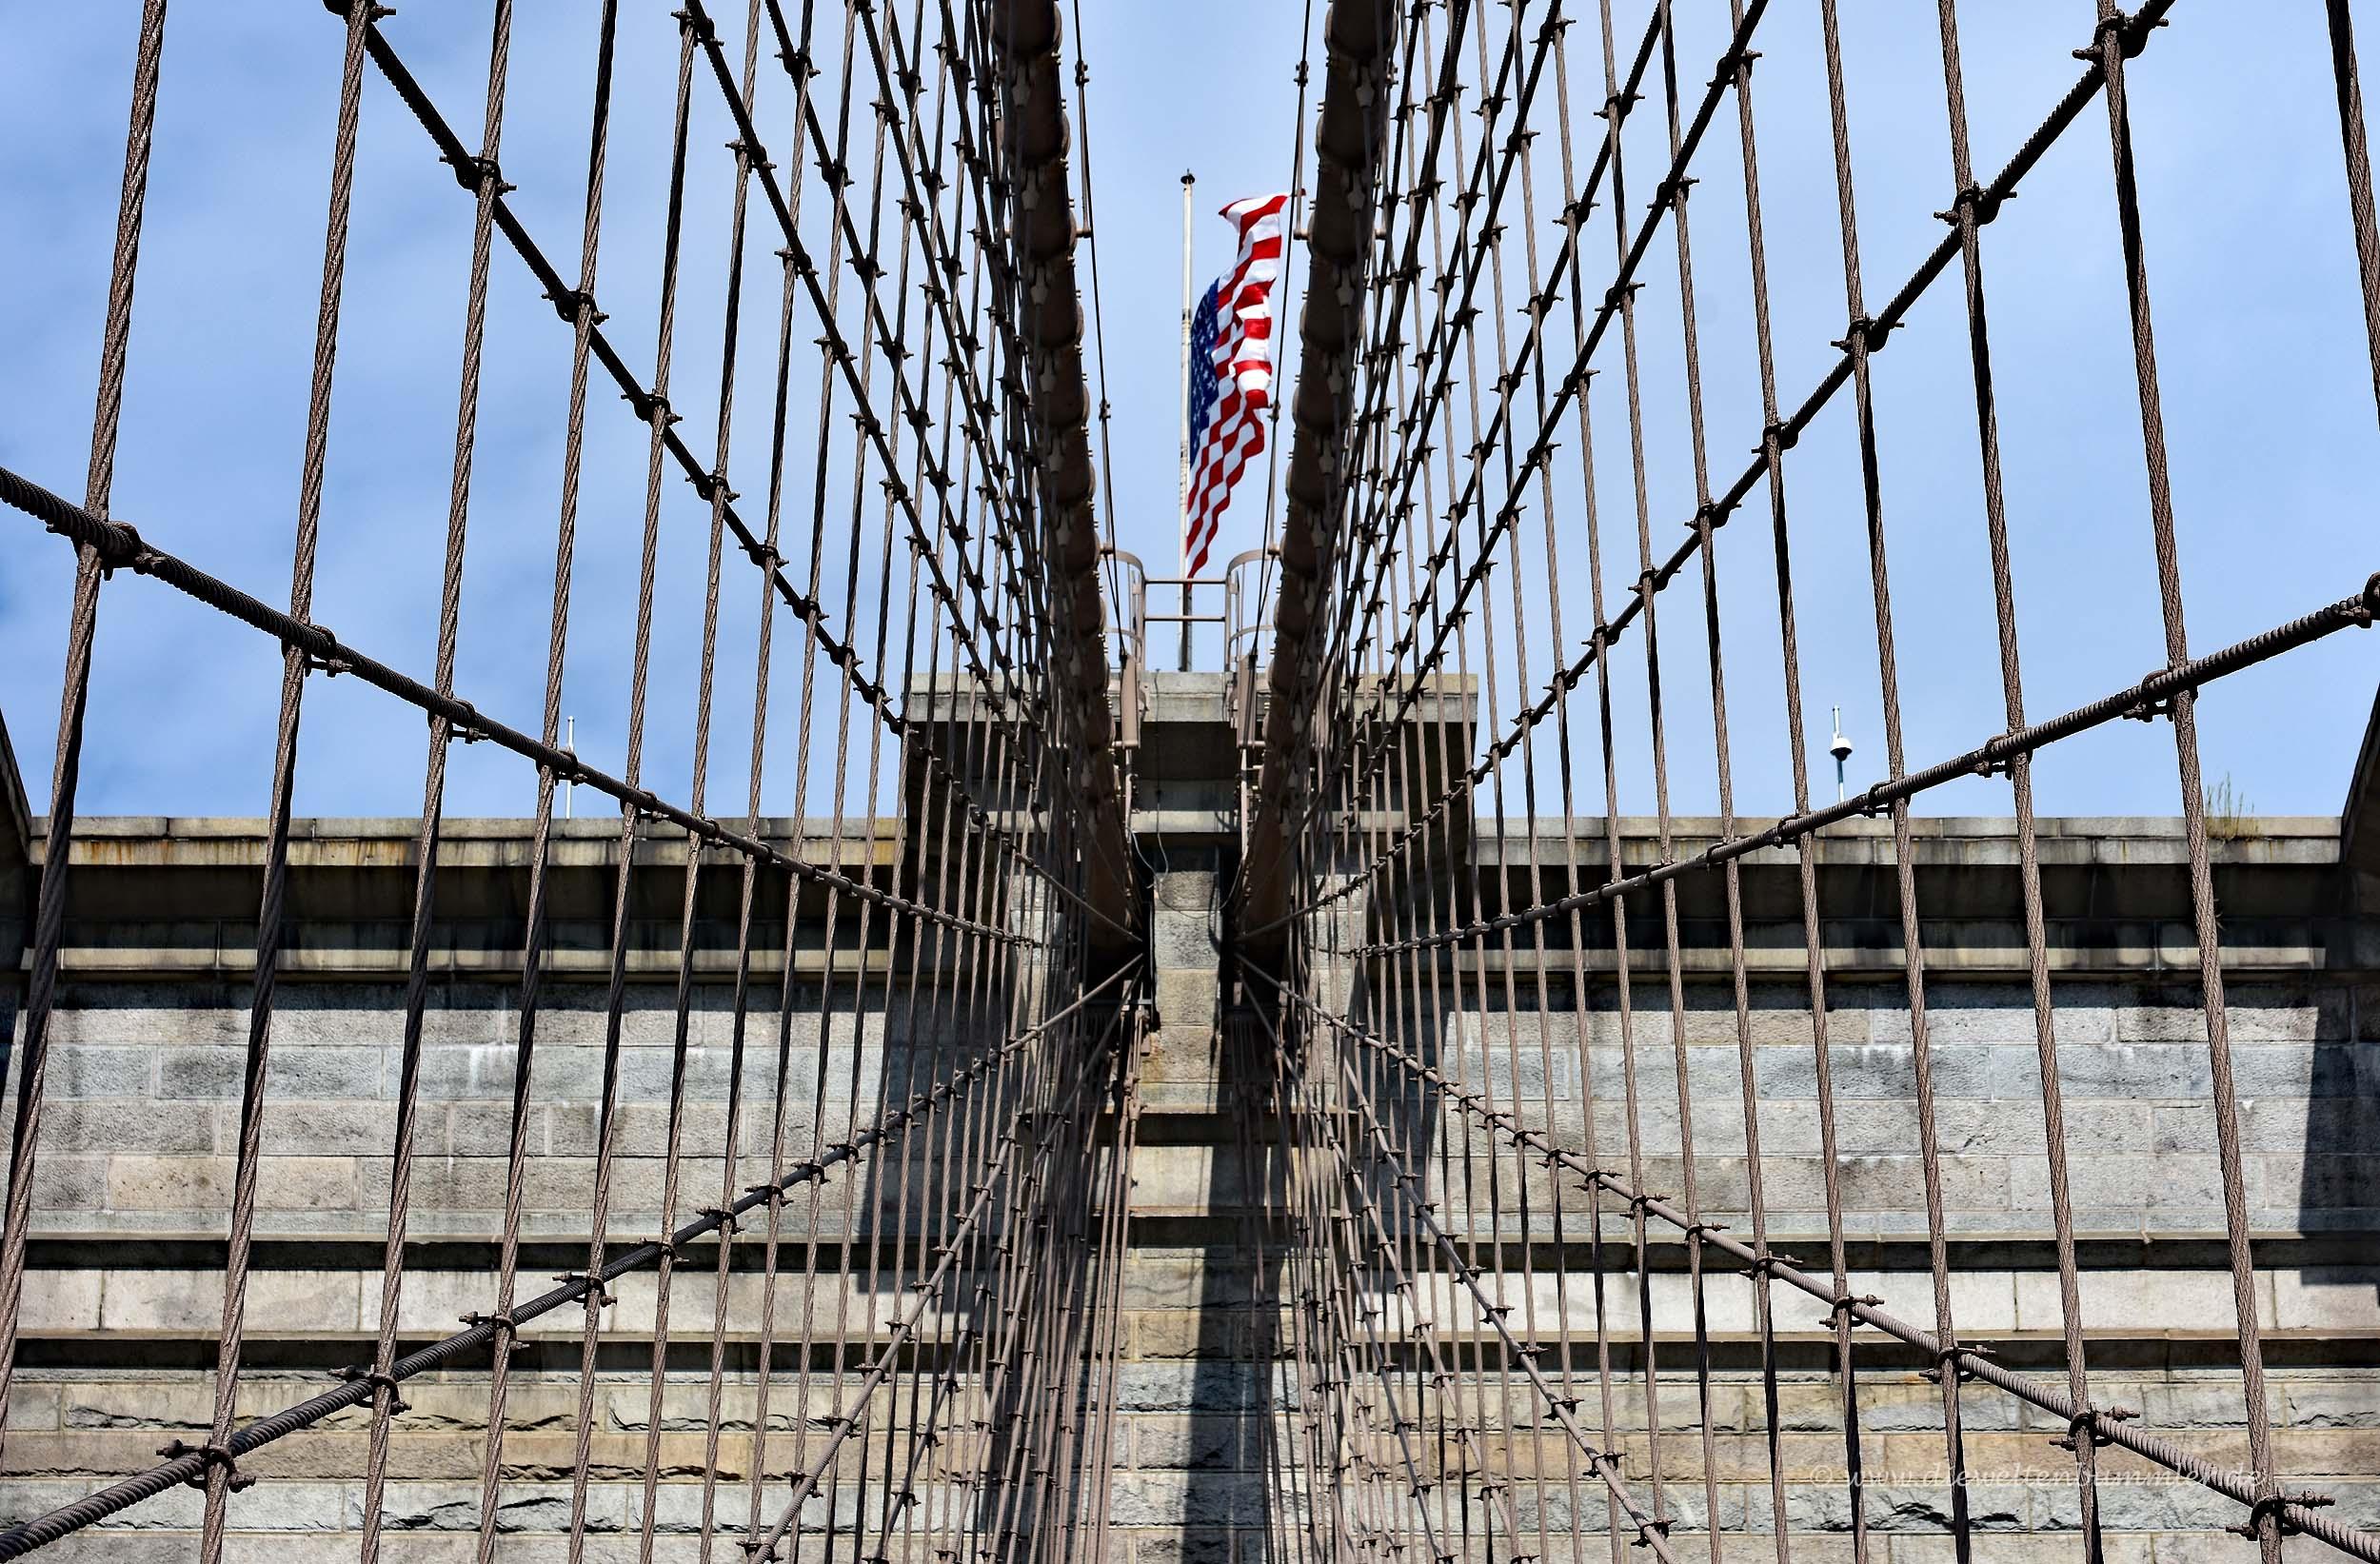 US-Flagge auf dem Brückenpfeiler